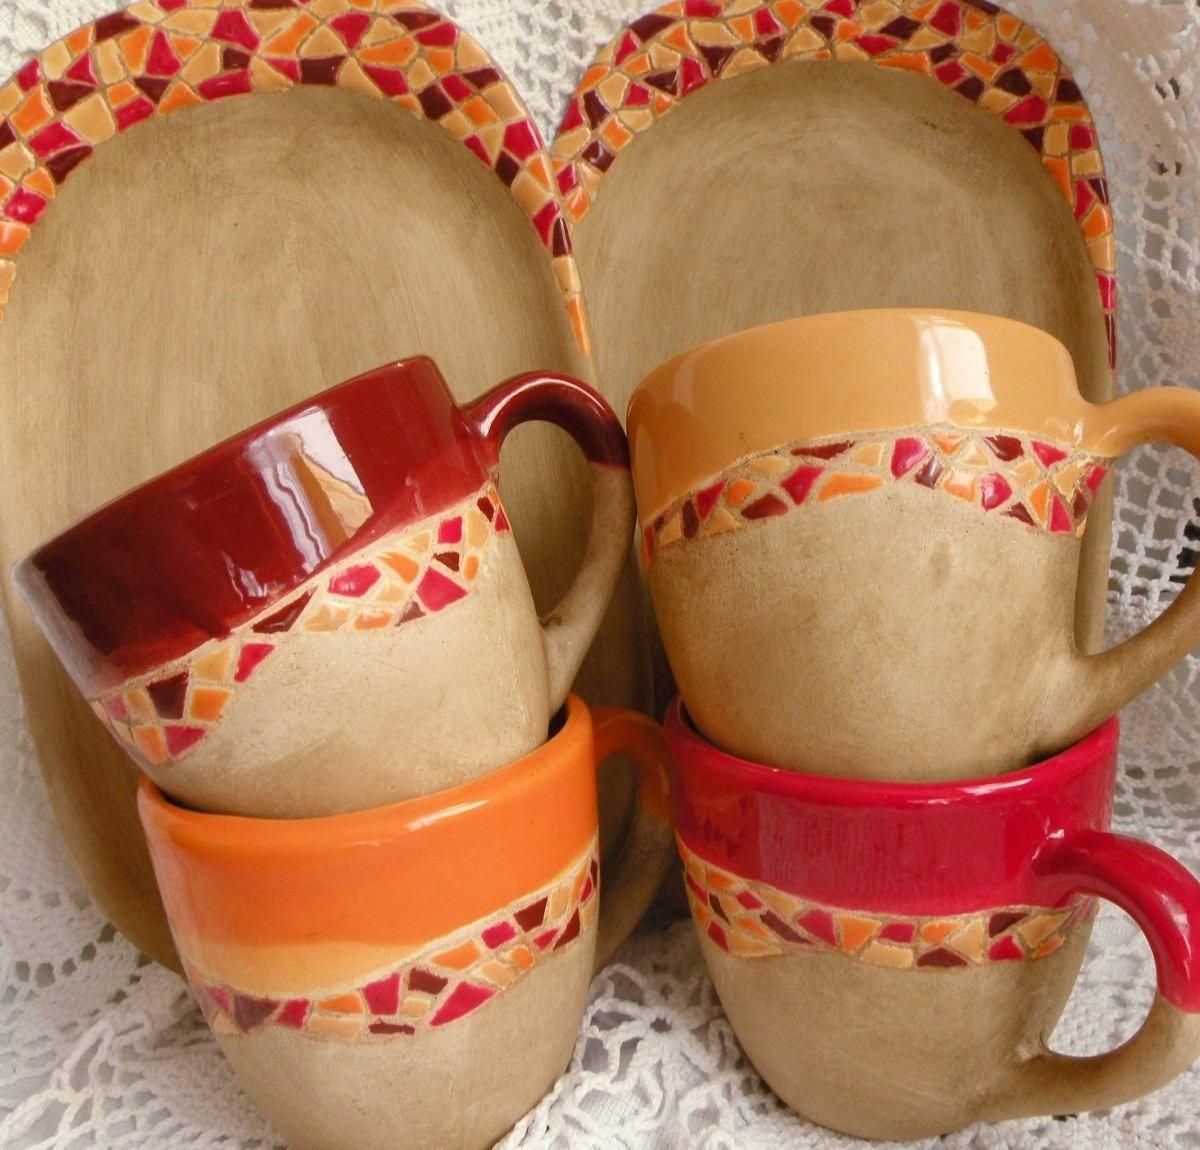 Vajilla de cer mica artesanal pintada a mano 250 00 en mercadolibre ceramics pinterest - Vajilla ceramica artesanal ...